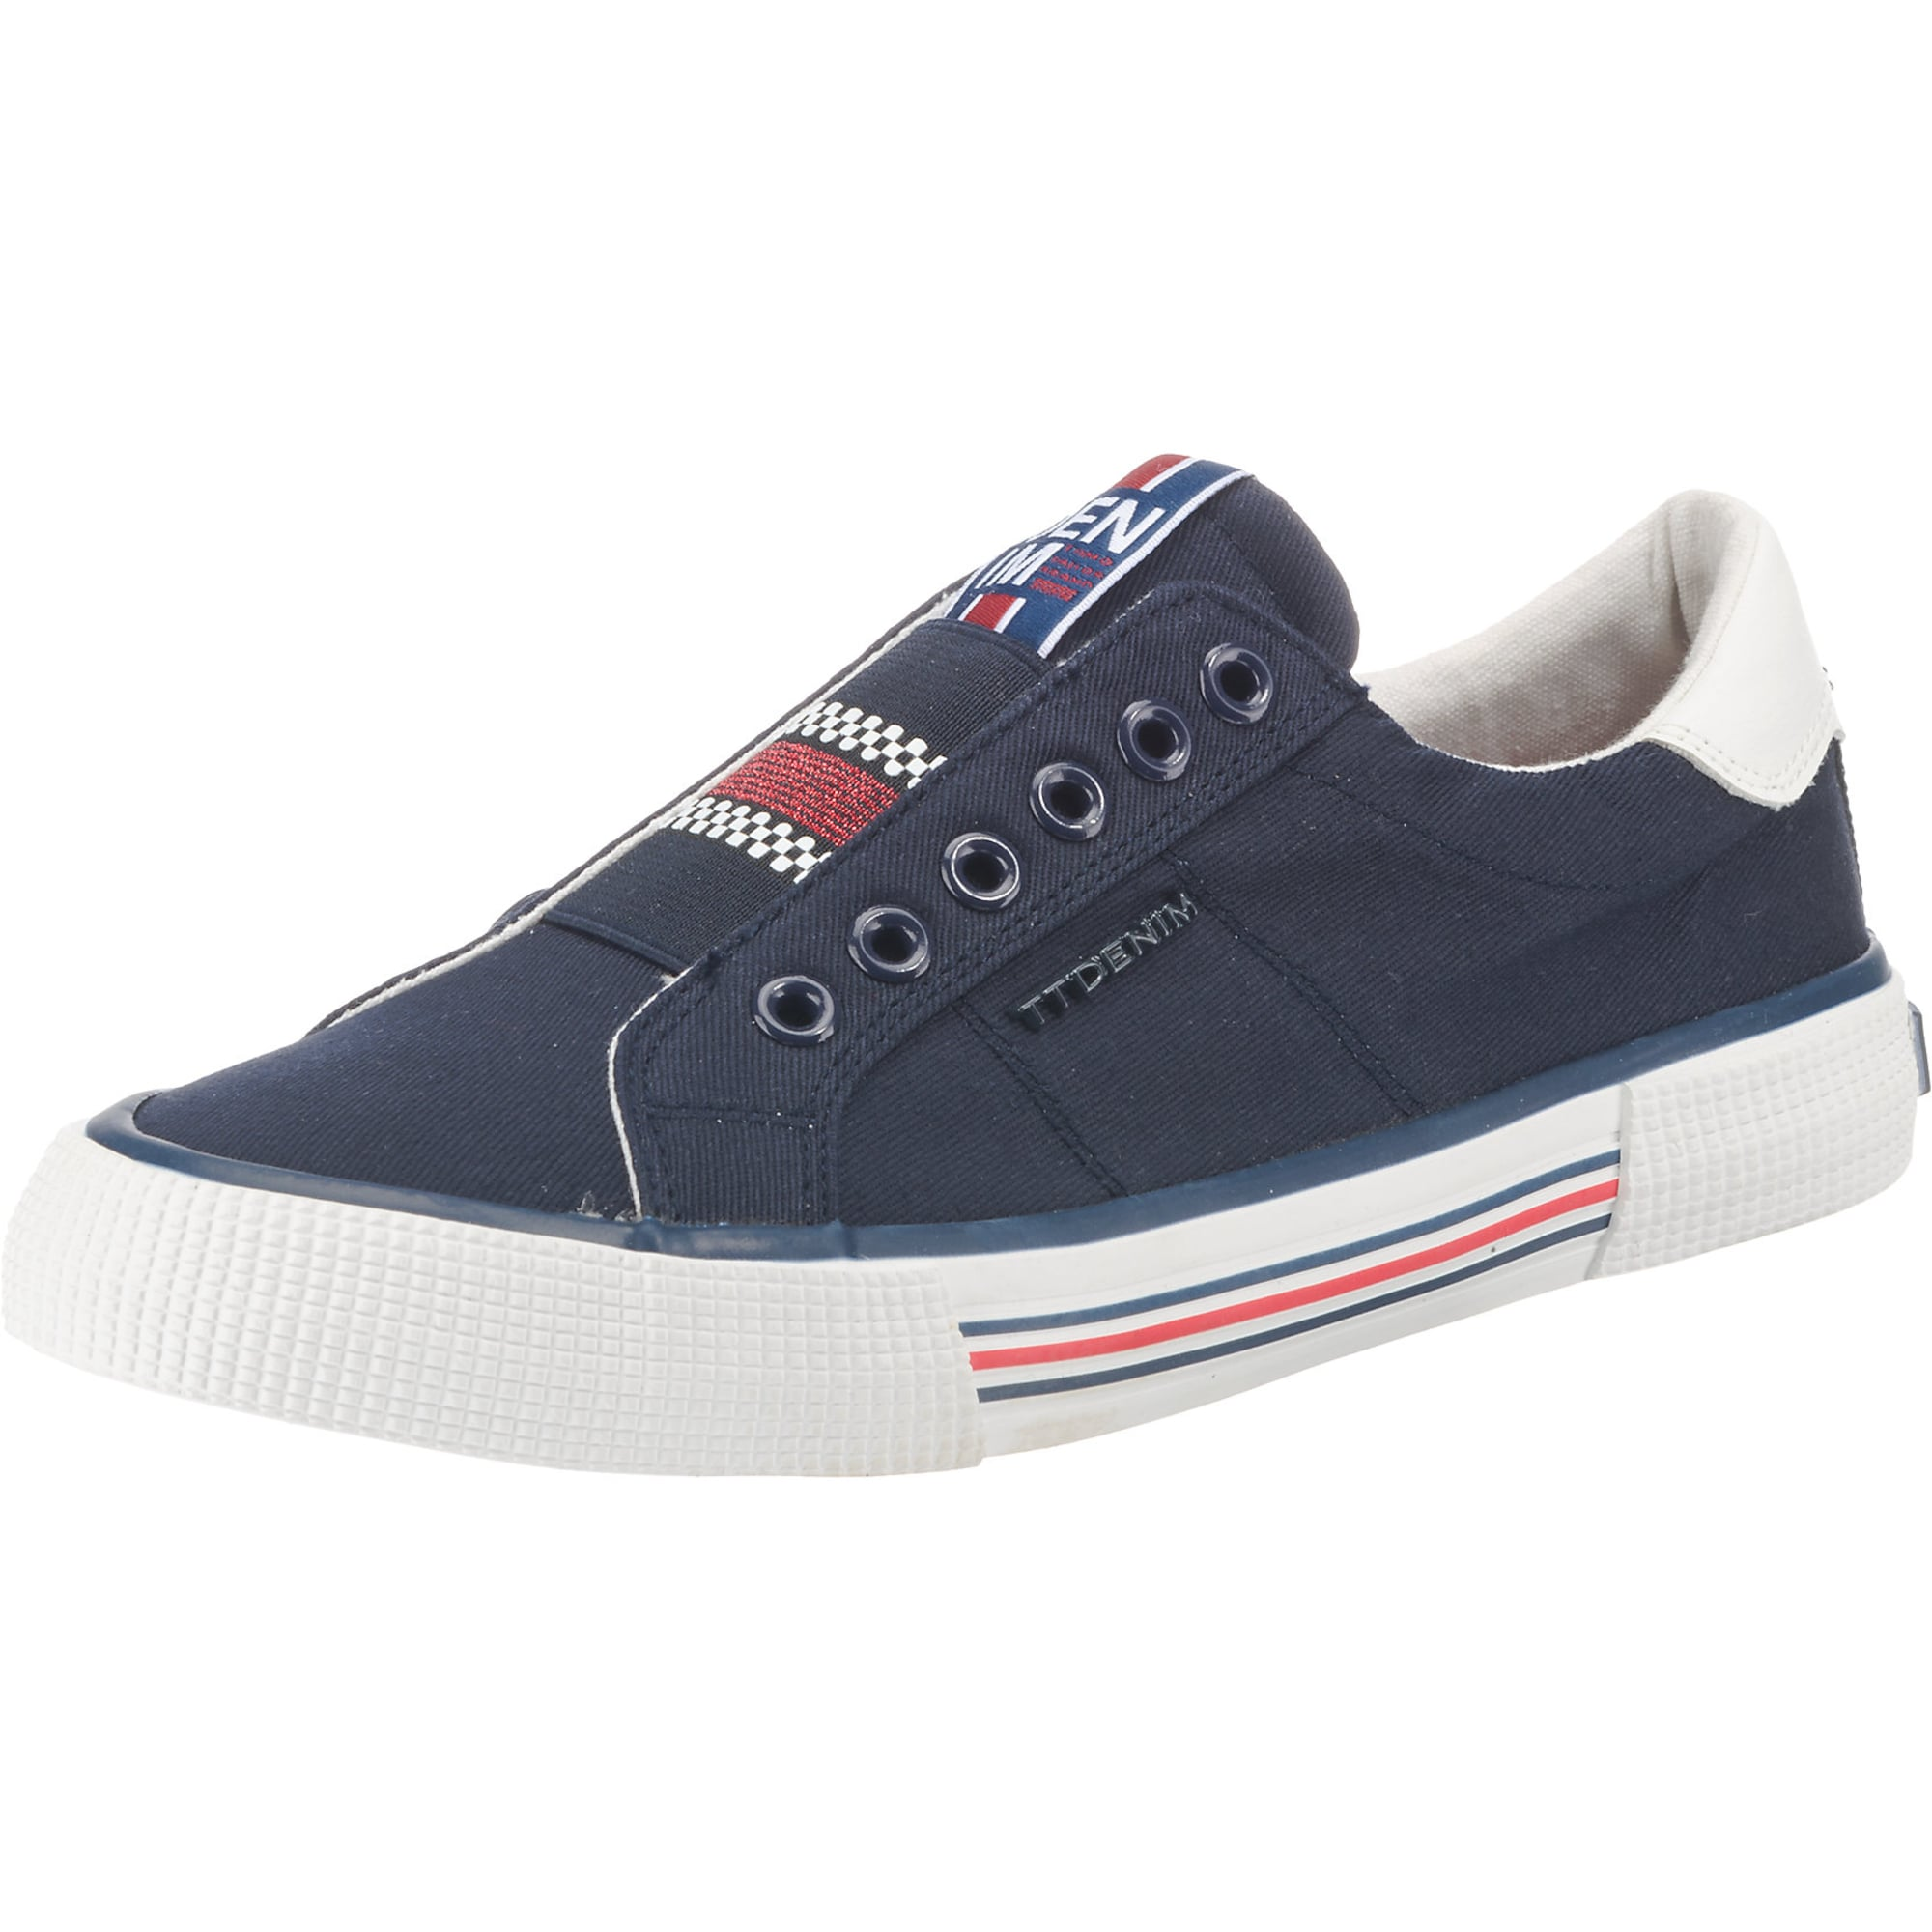 Slip on boty marine modrá mix barev TOM TAILOR